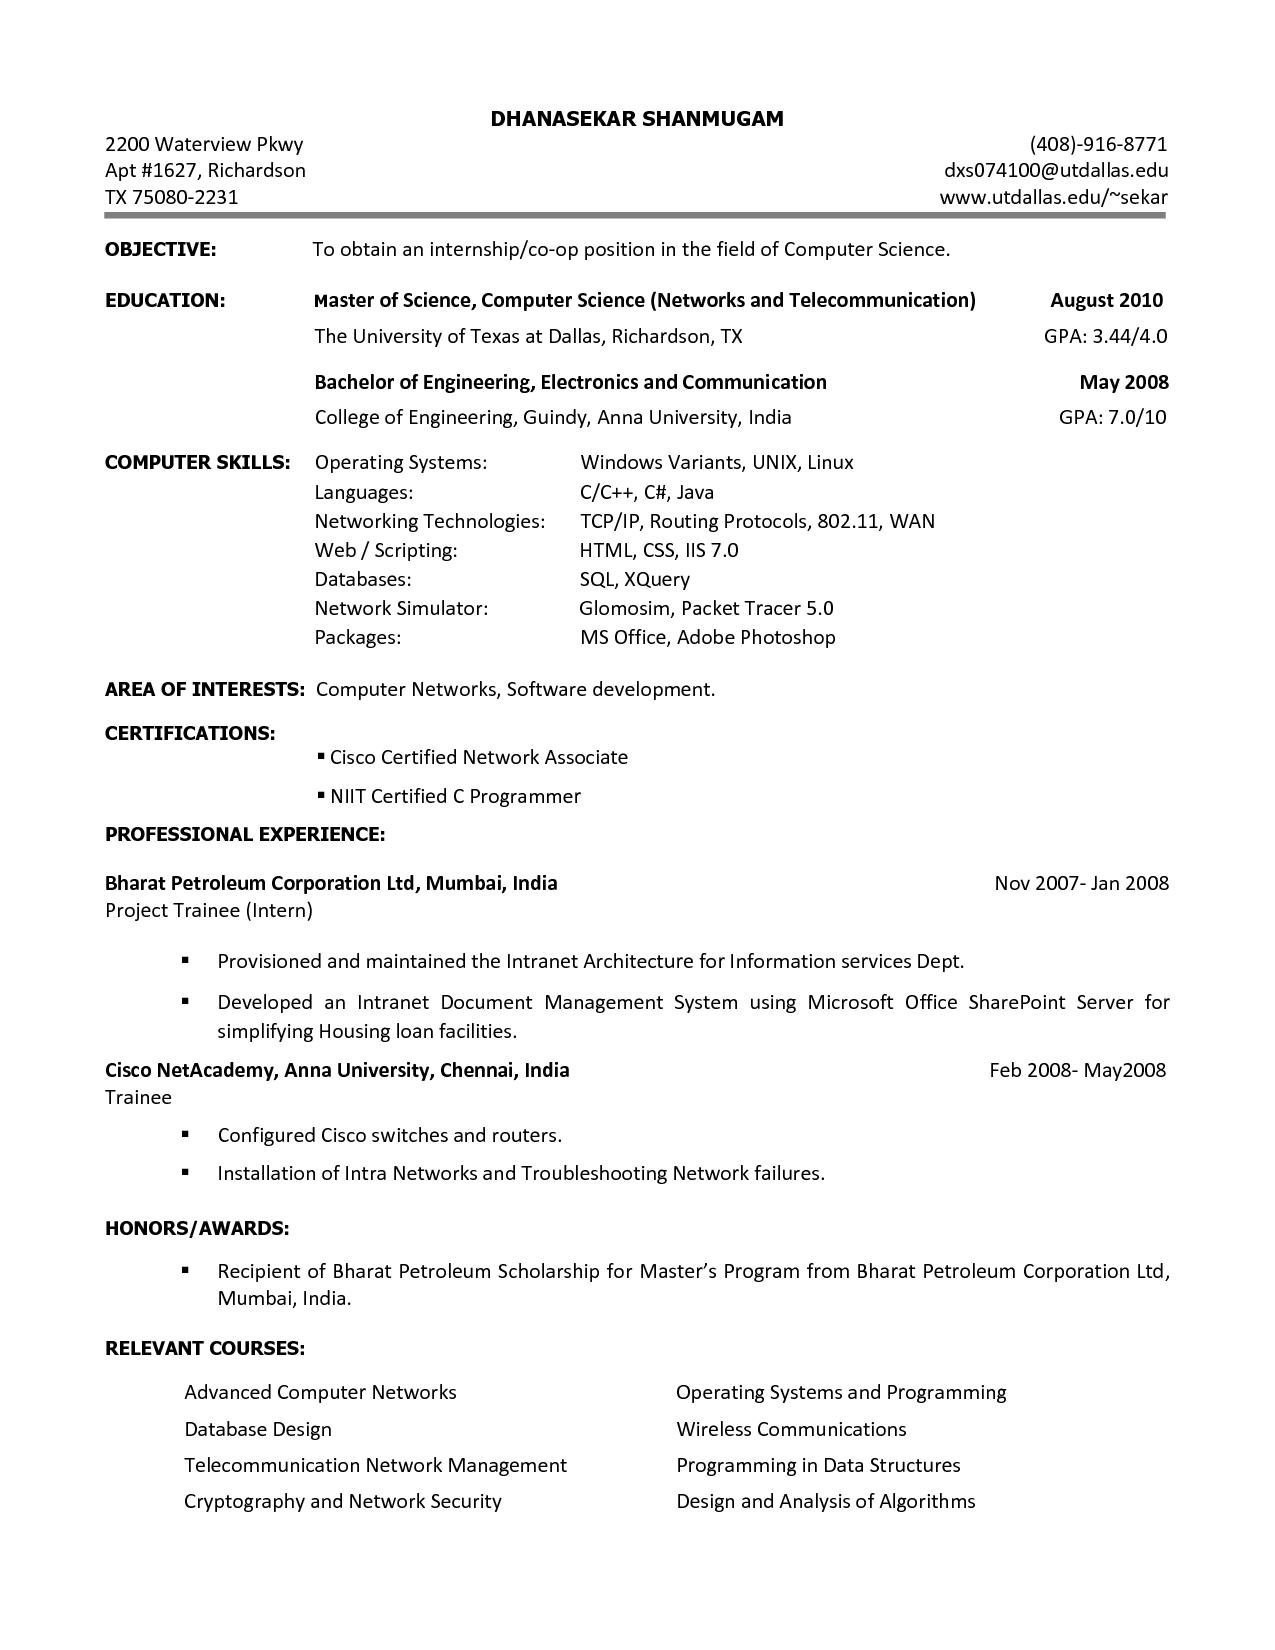 Resume For Internship Software Krys Tk